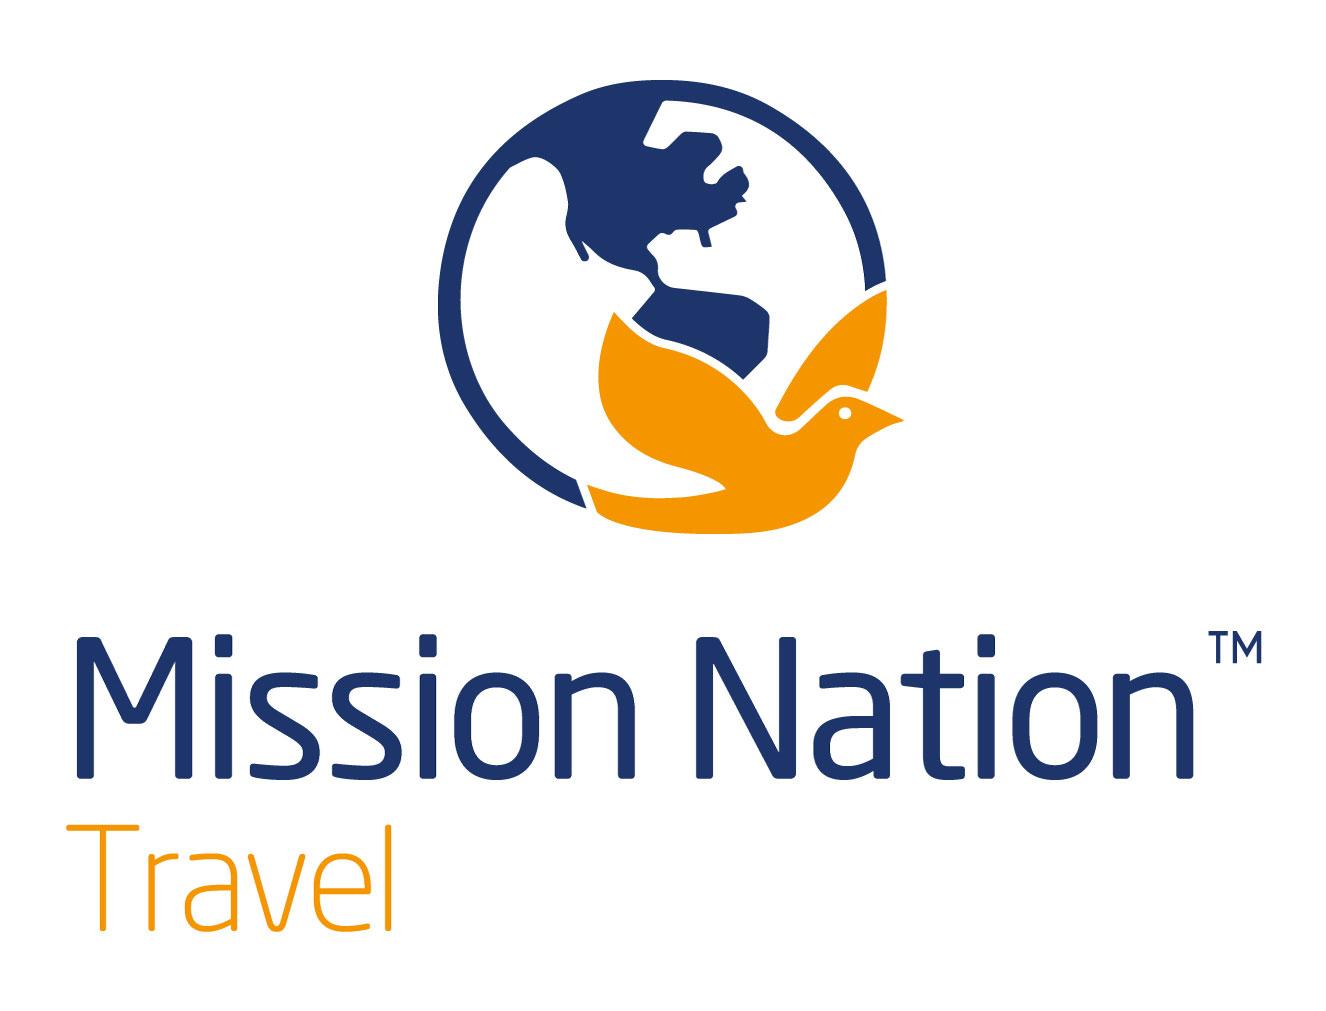 Mission Nation Travel